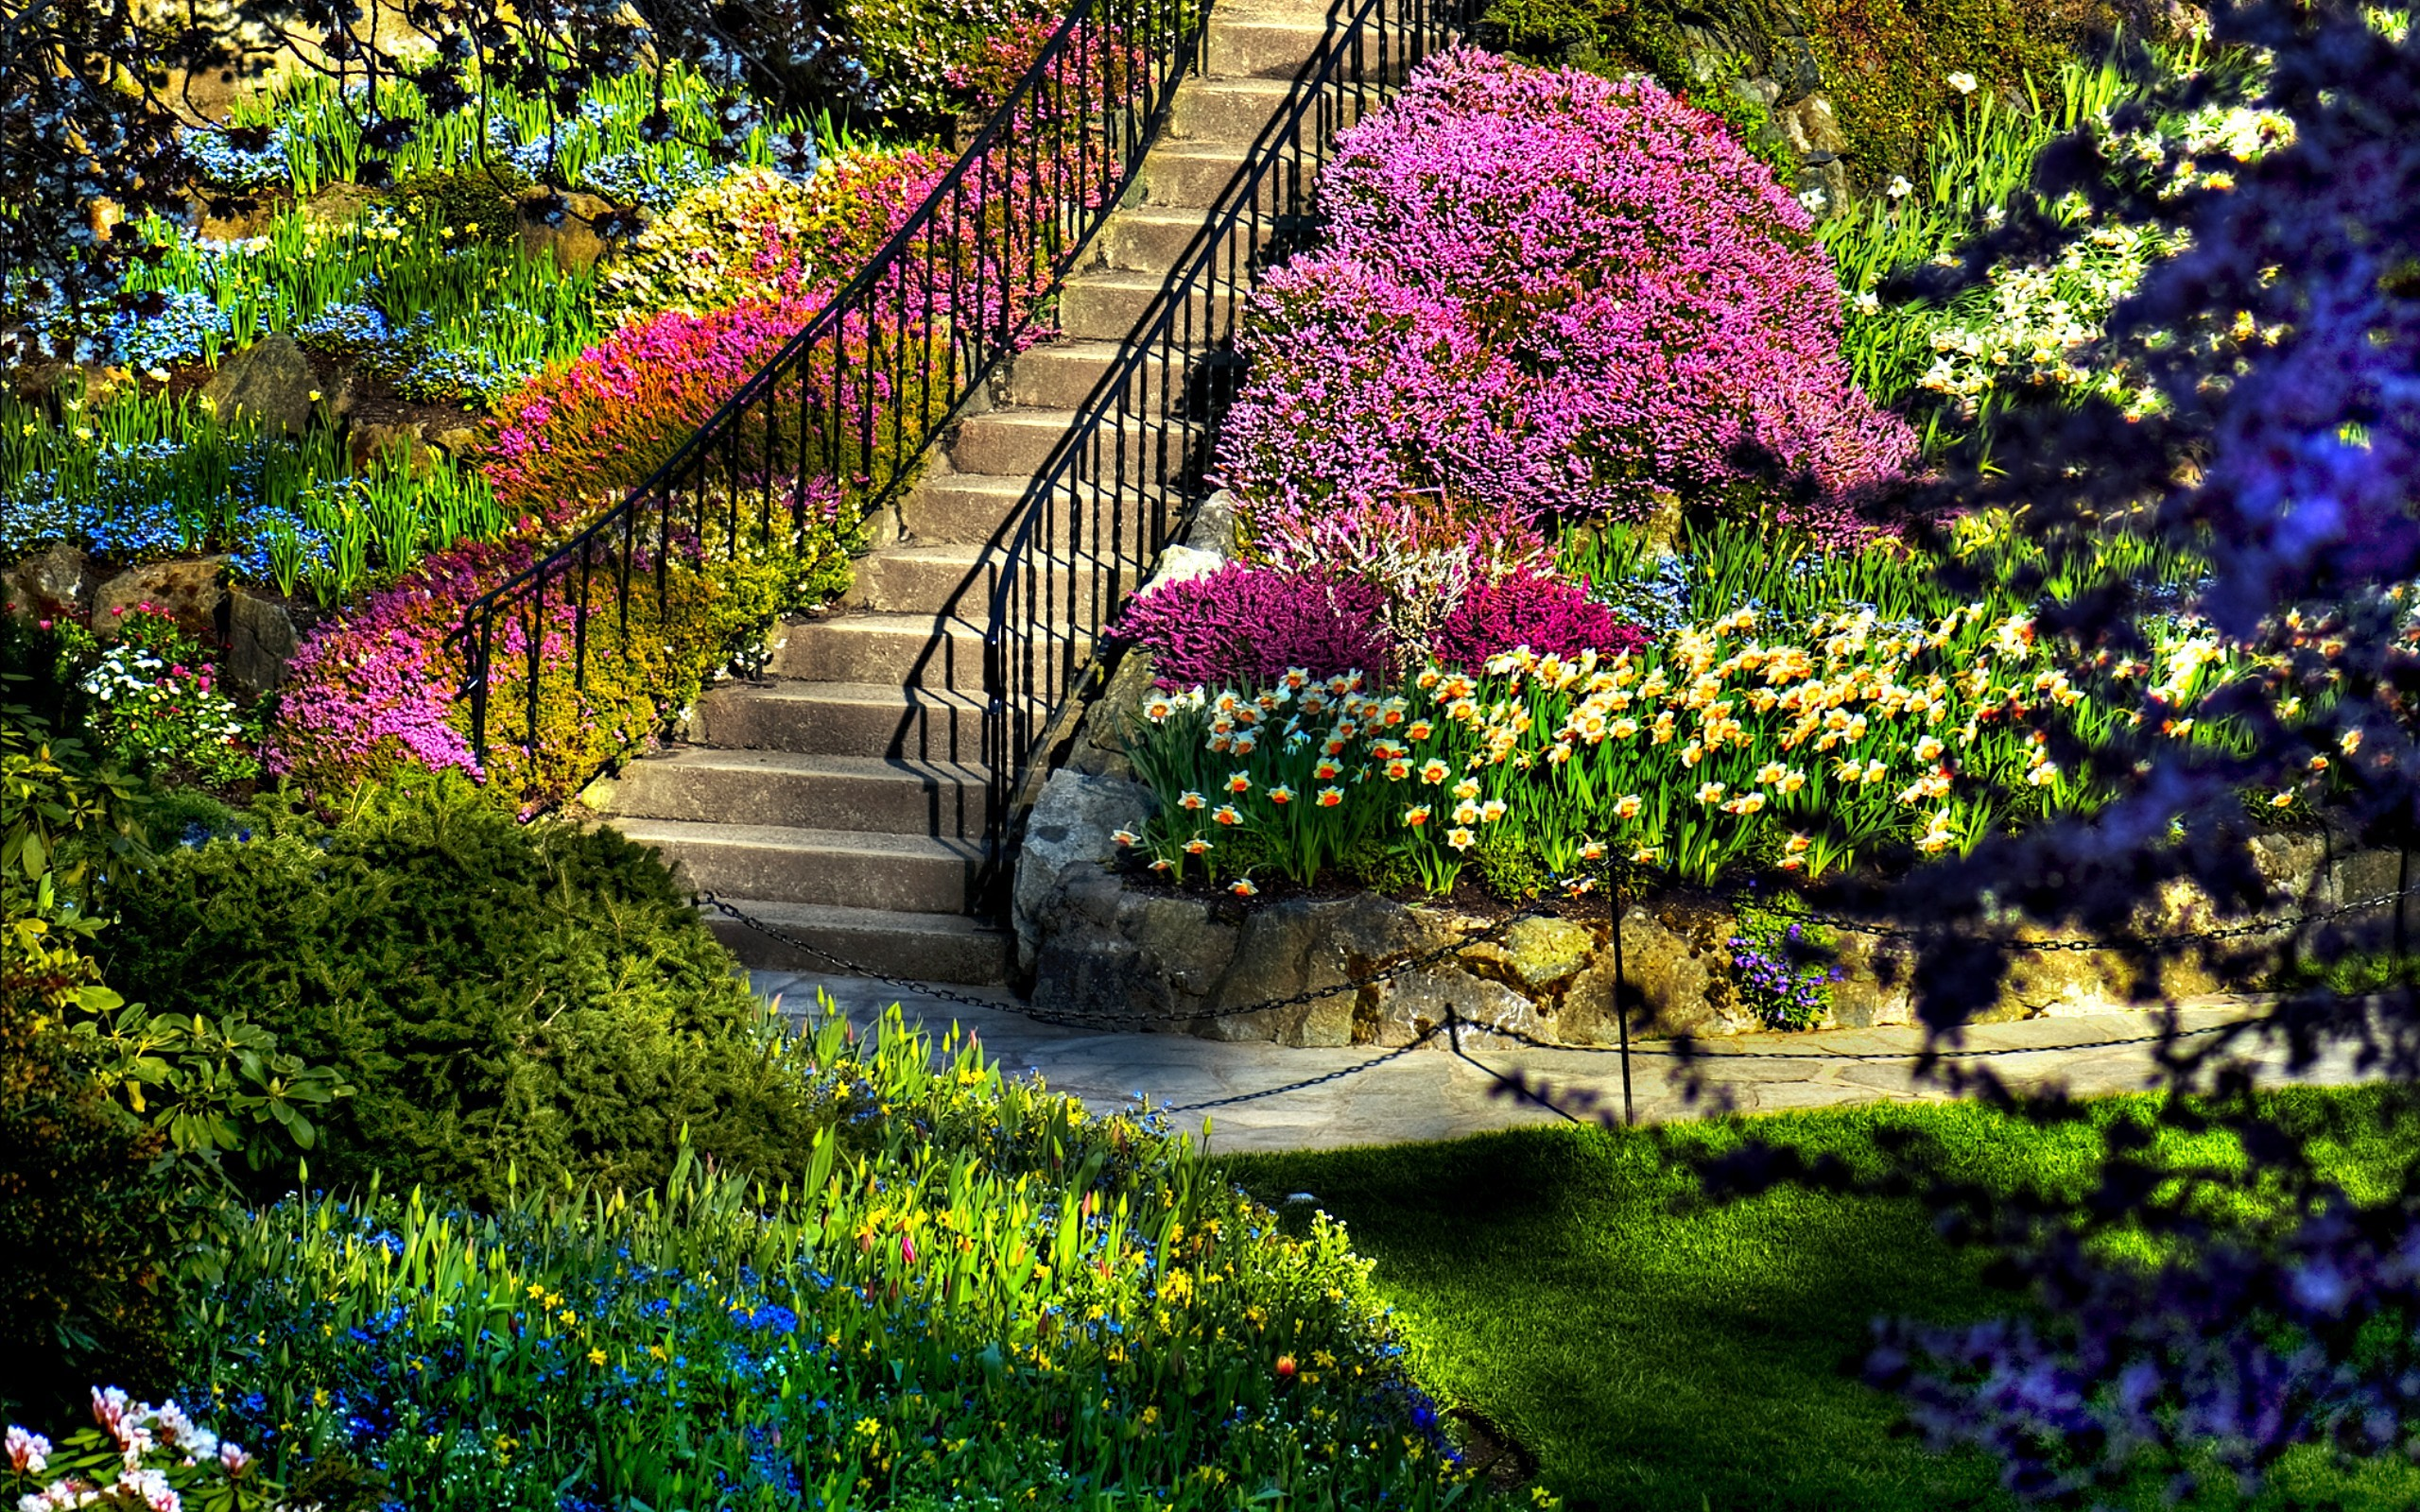 Beautiful Nature Background 56 Images